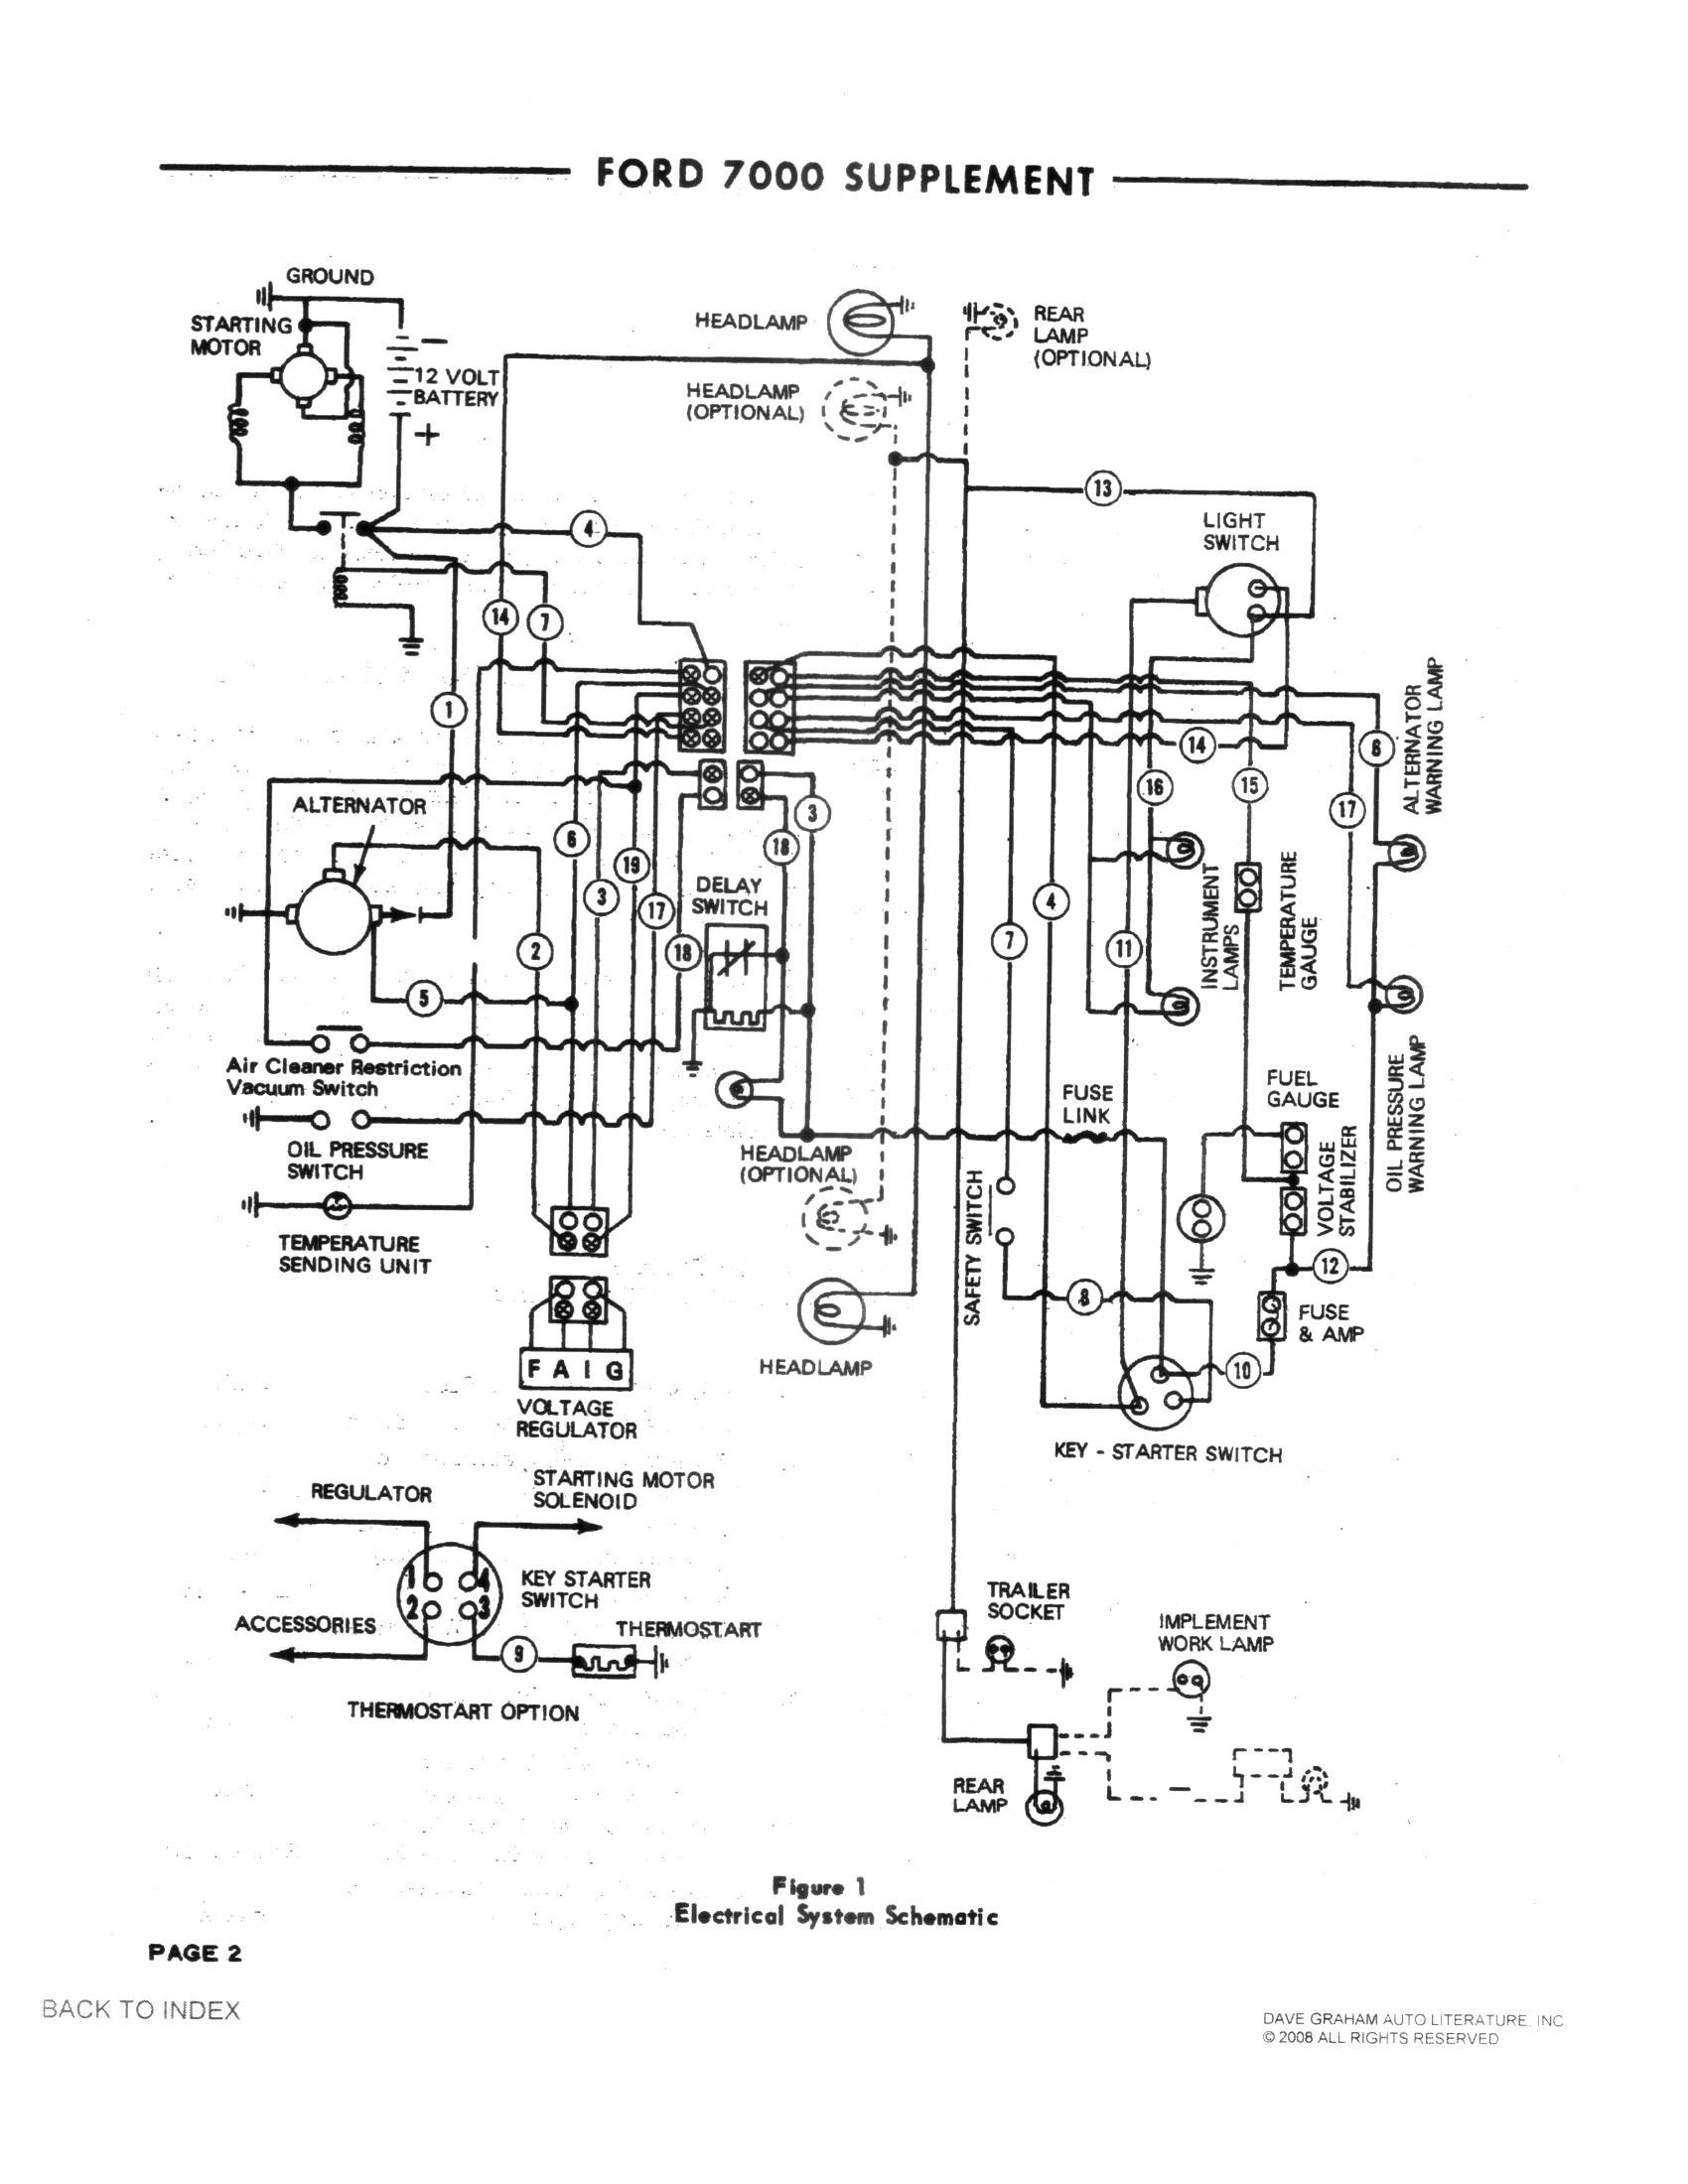 medium resolution of motorola alternator wiring diagram john deere wiring diagram hostunique motorola alternator wiring diagram john deere diagrams